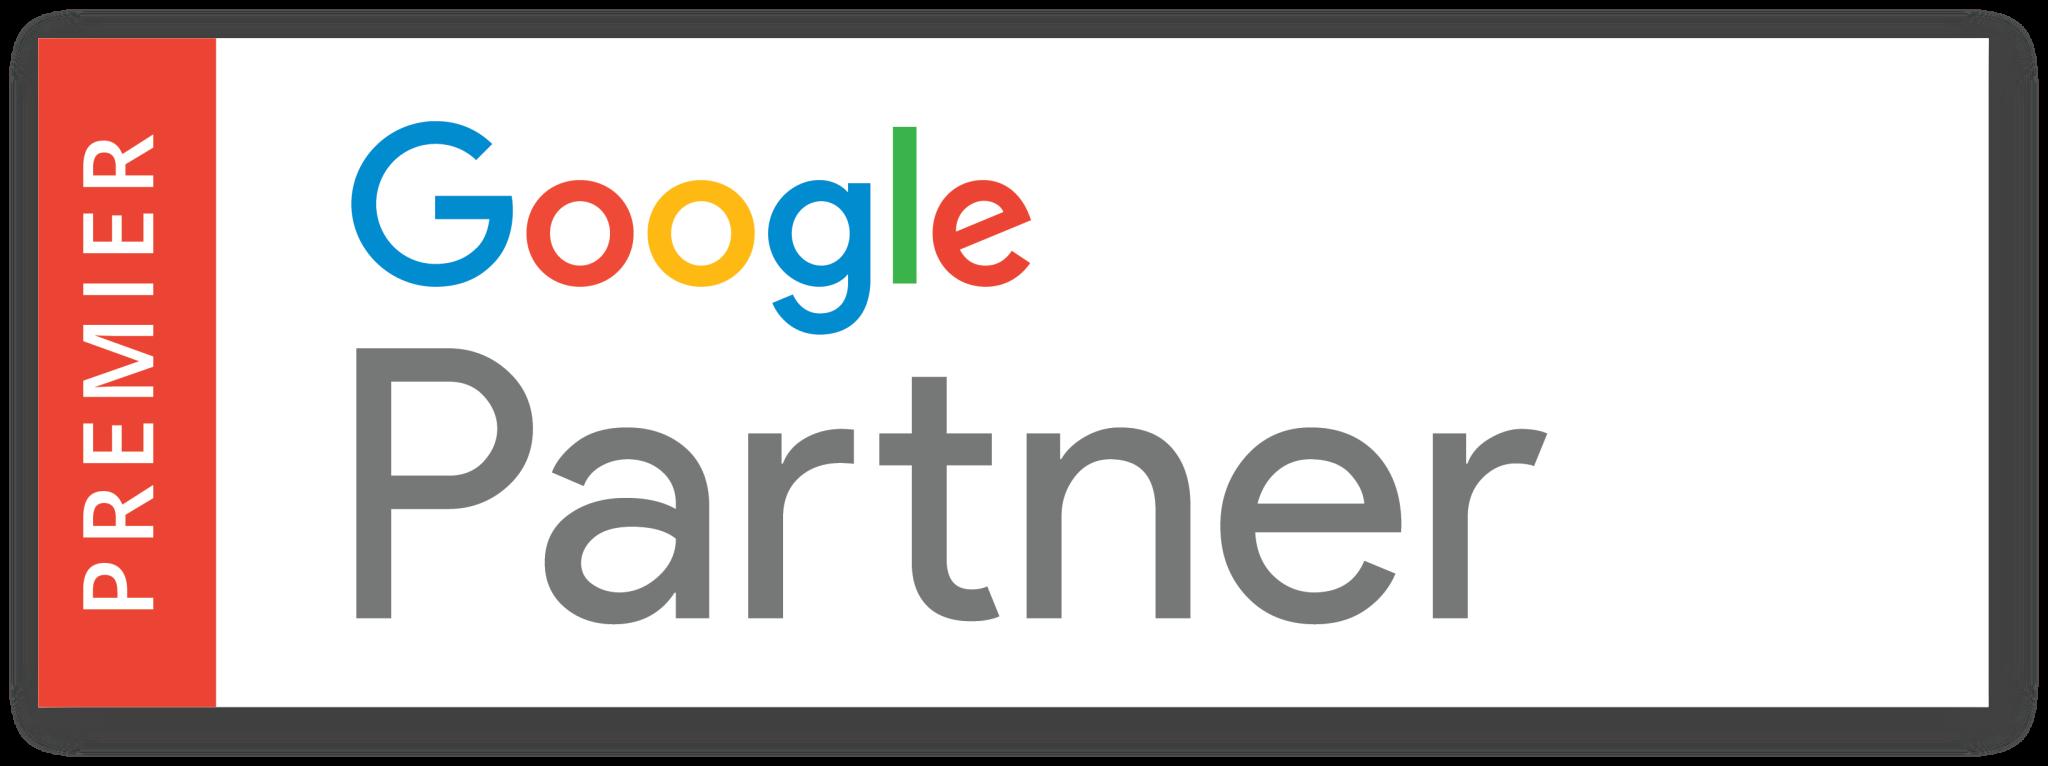 Google partner png. Ignite digital achieved premier